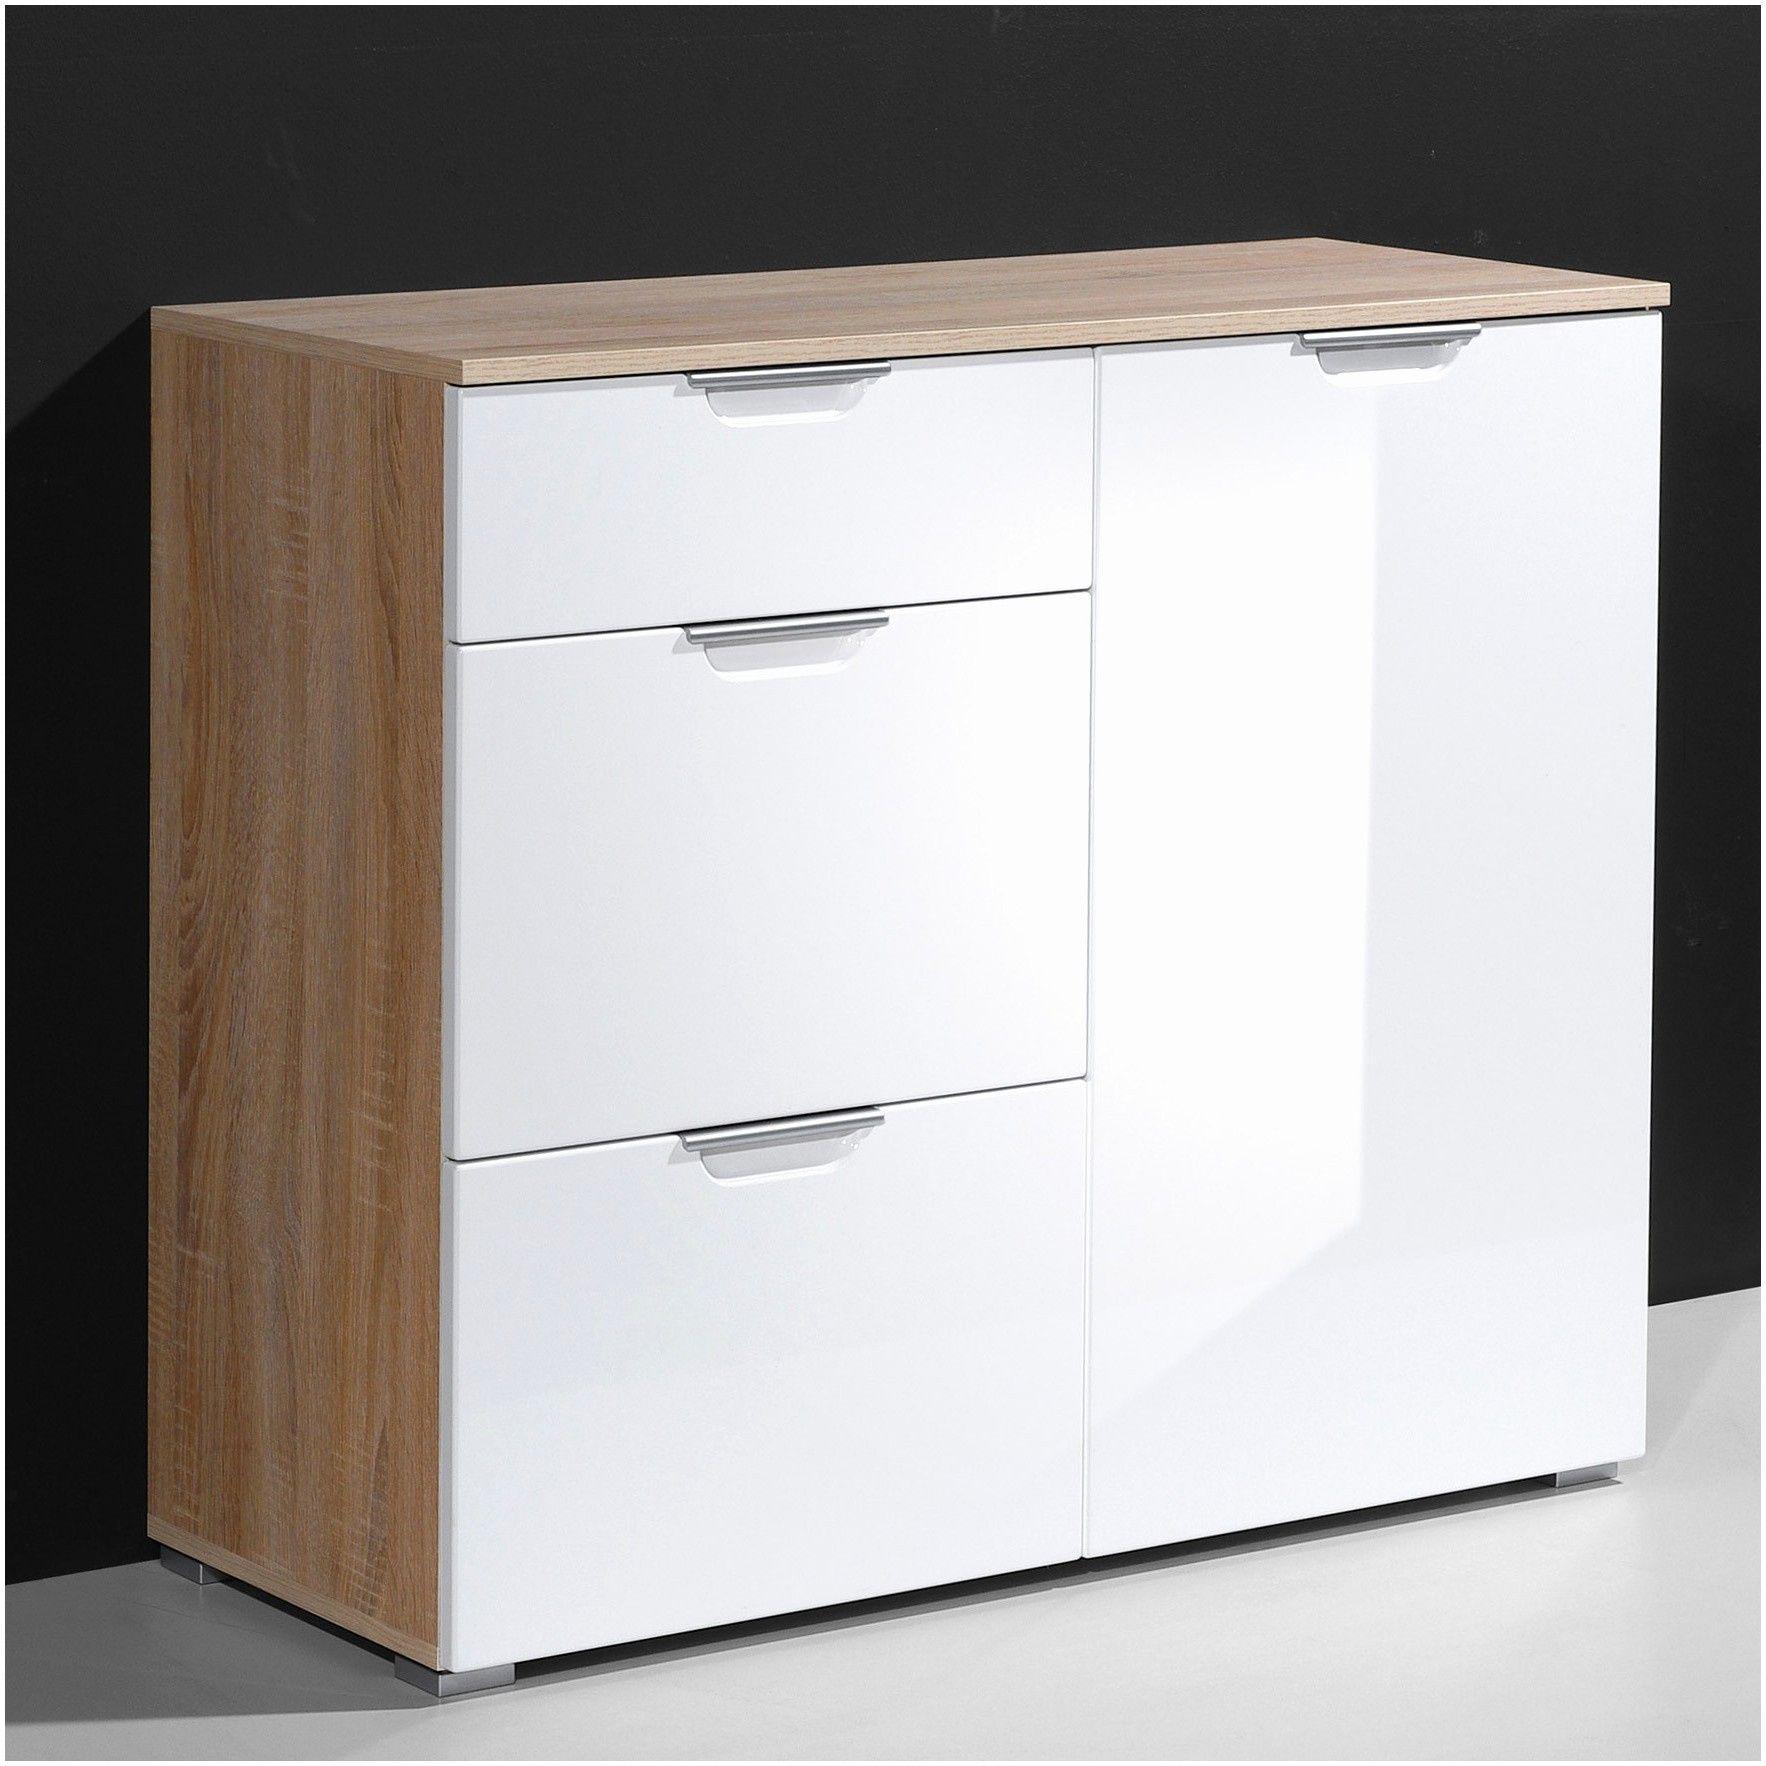 12 Incroyable Jolie Meuble Dossier Suspendu Ikea Pics Check More At Https Www Francescresswelsing Com 12 Incroyable Jolie Meu Filing Cabinet Home Decor Home